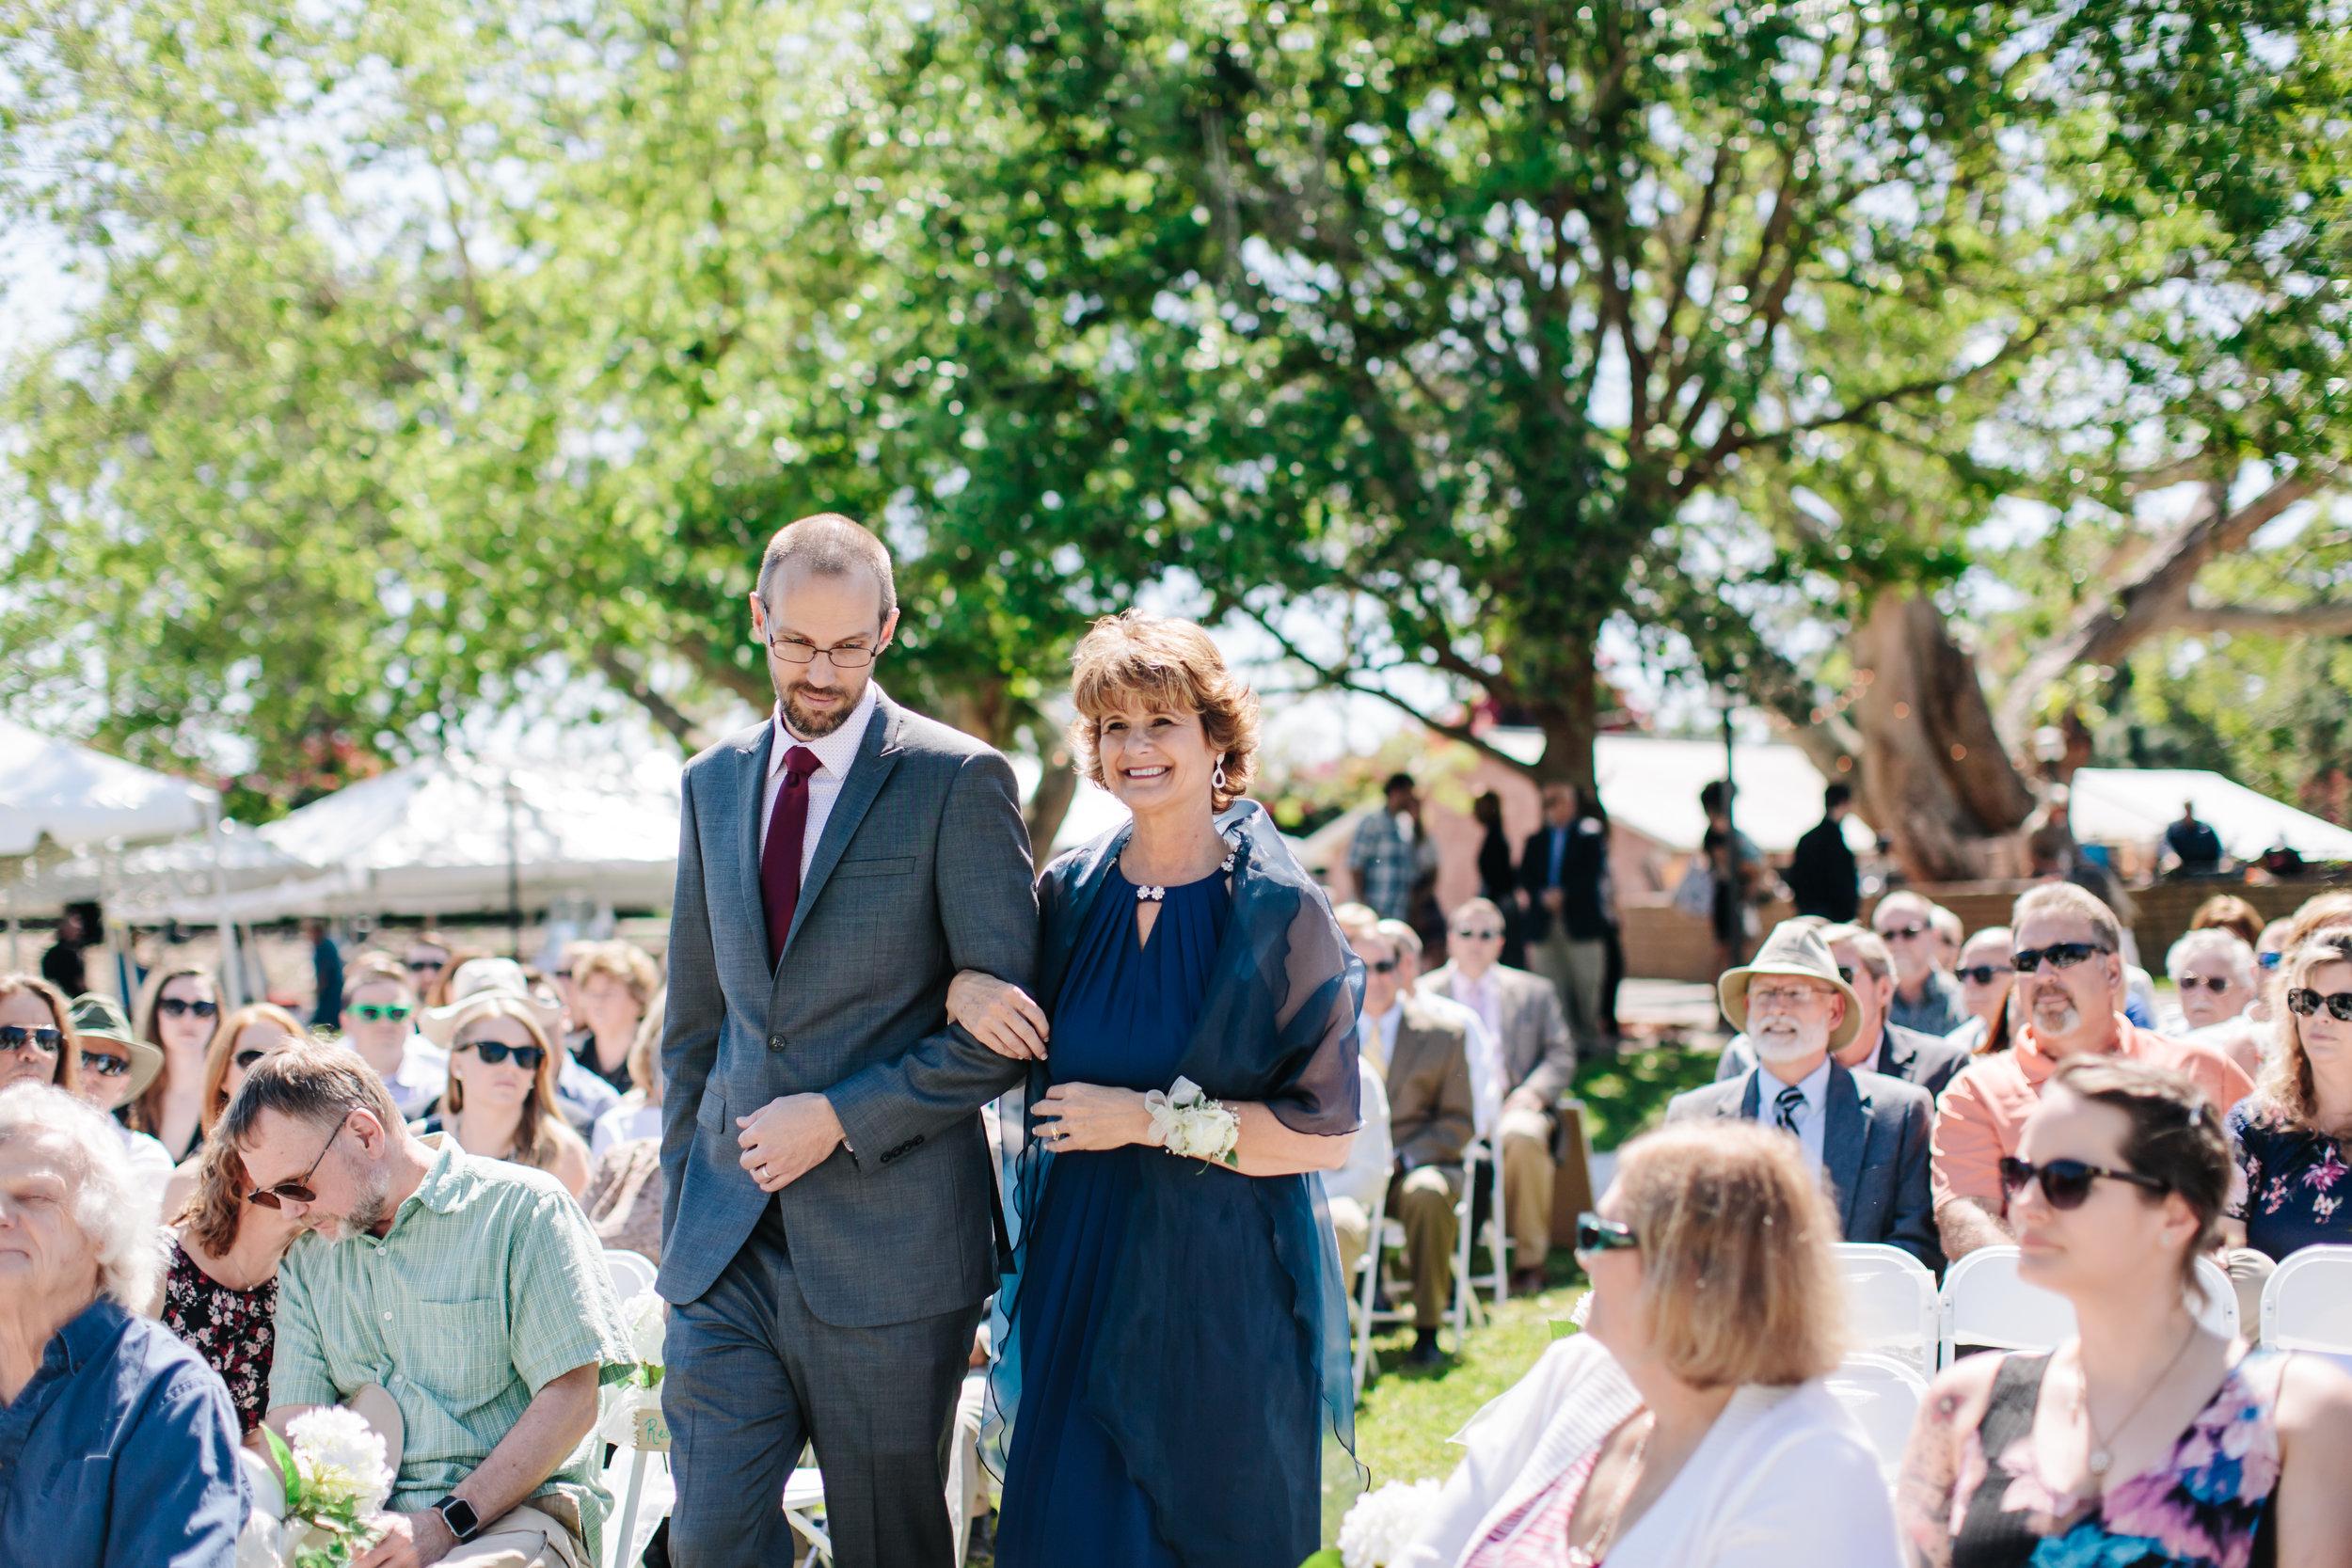 2018.03.17 Allison and Chuck Wedding Waelti Melbourne (212 of 900).jpg